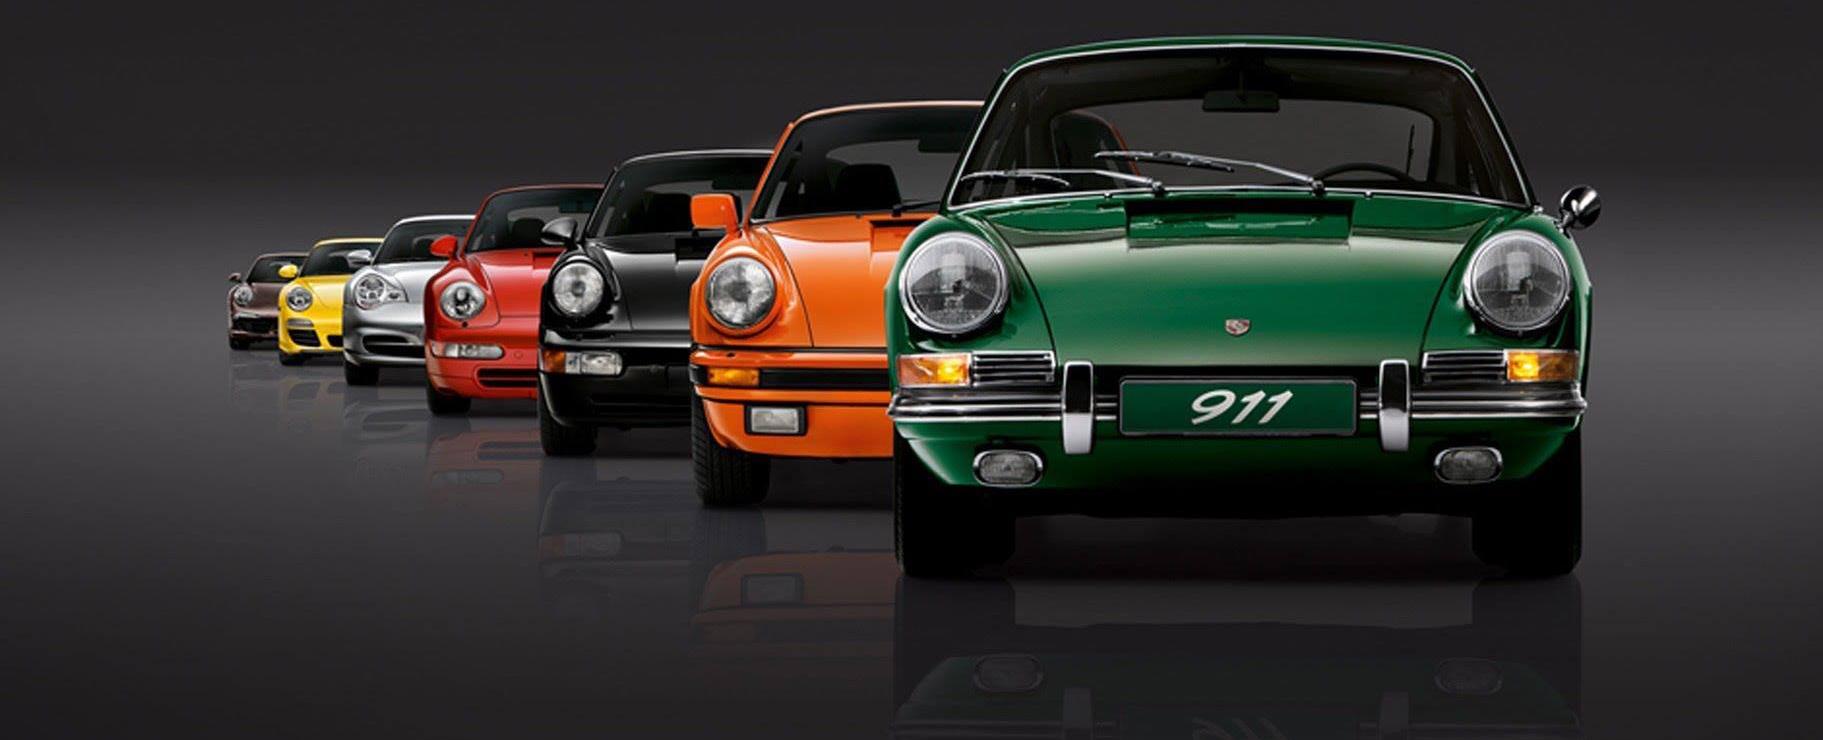 Kultna serija Porsche 911.